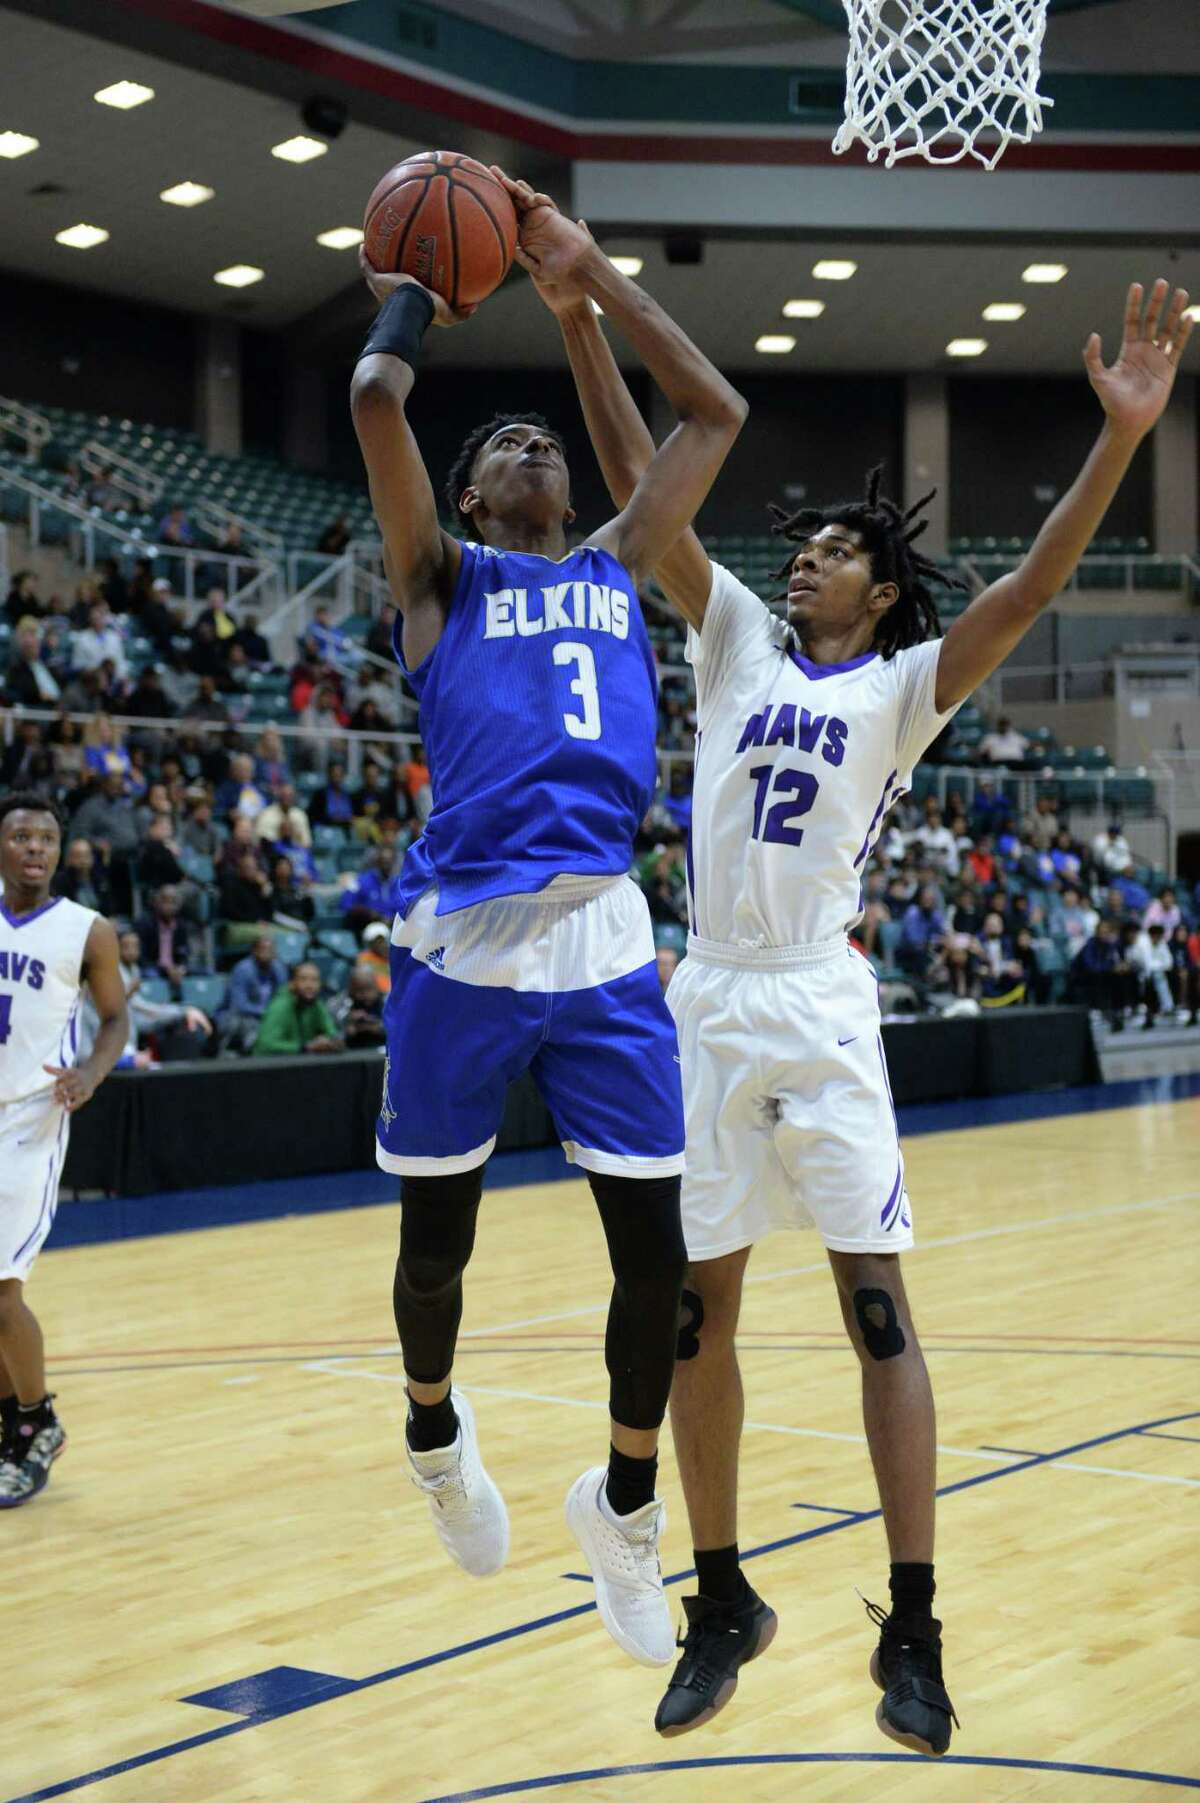 Donovan Williams will make his presence felt for Elkins at regionals.